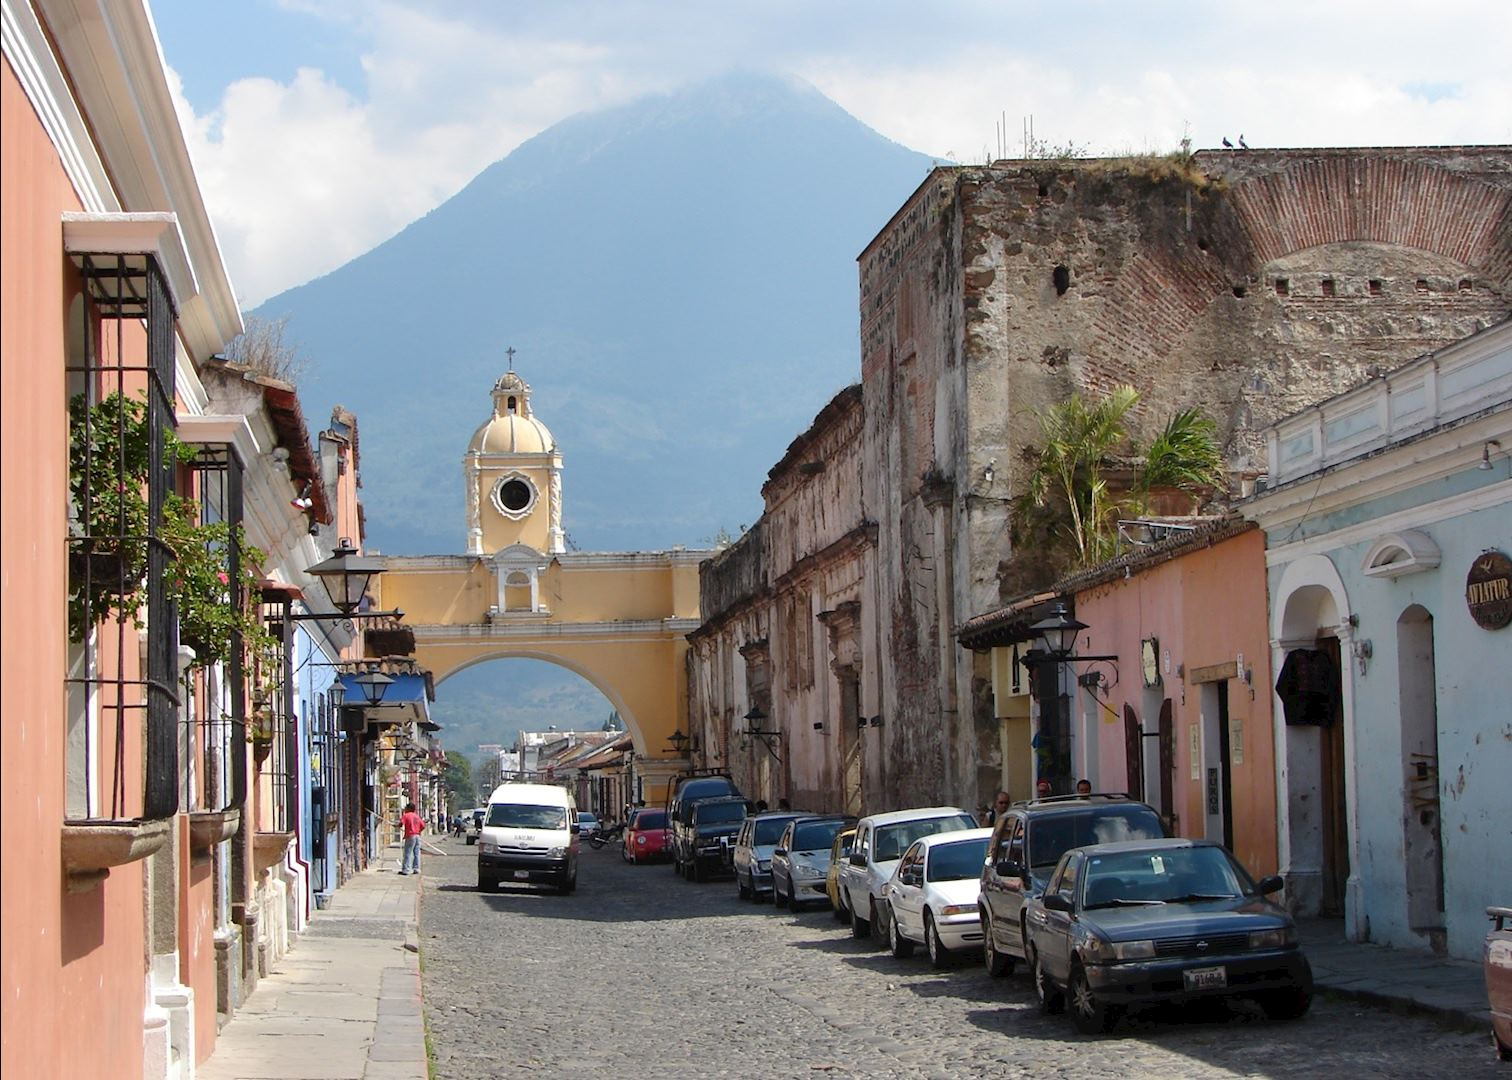 Grand tour of Guatemala